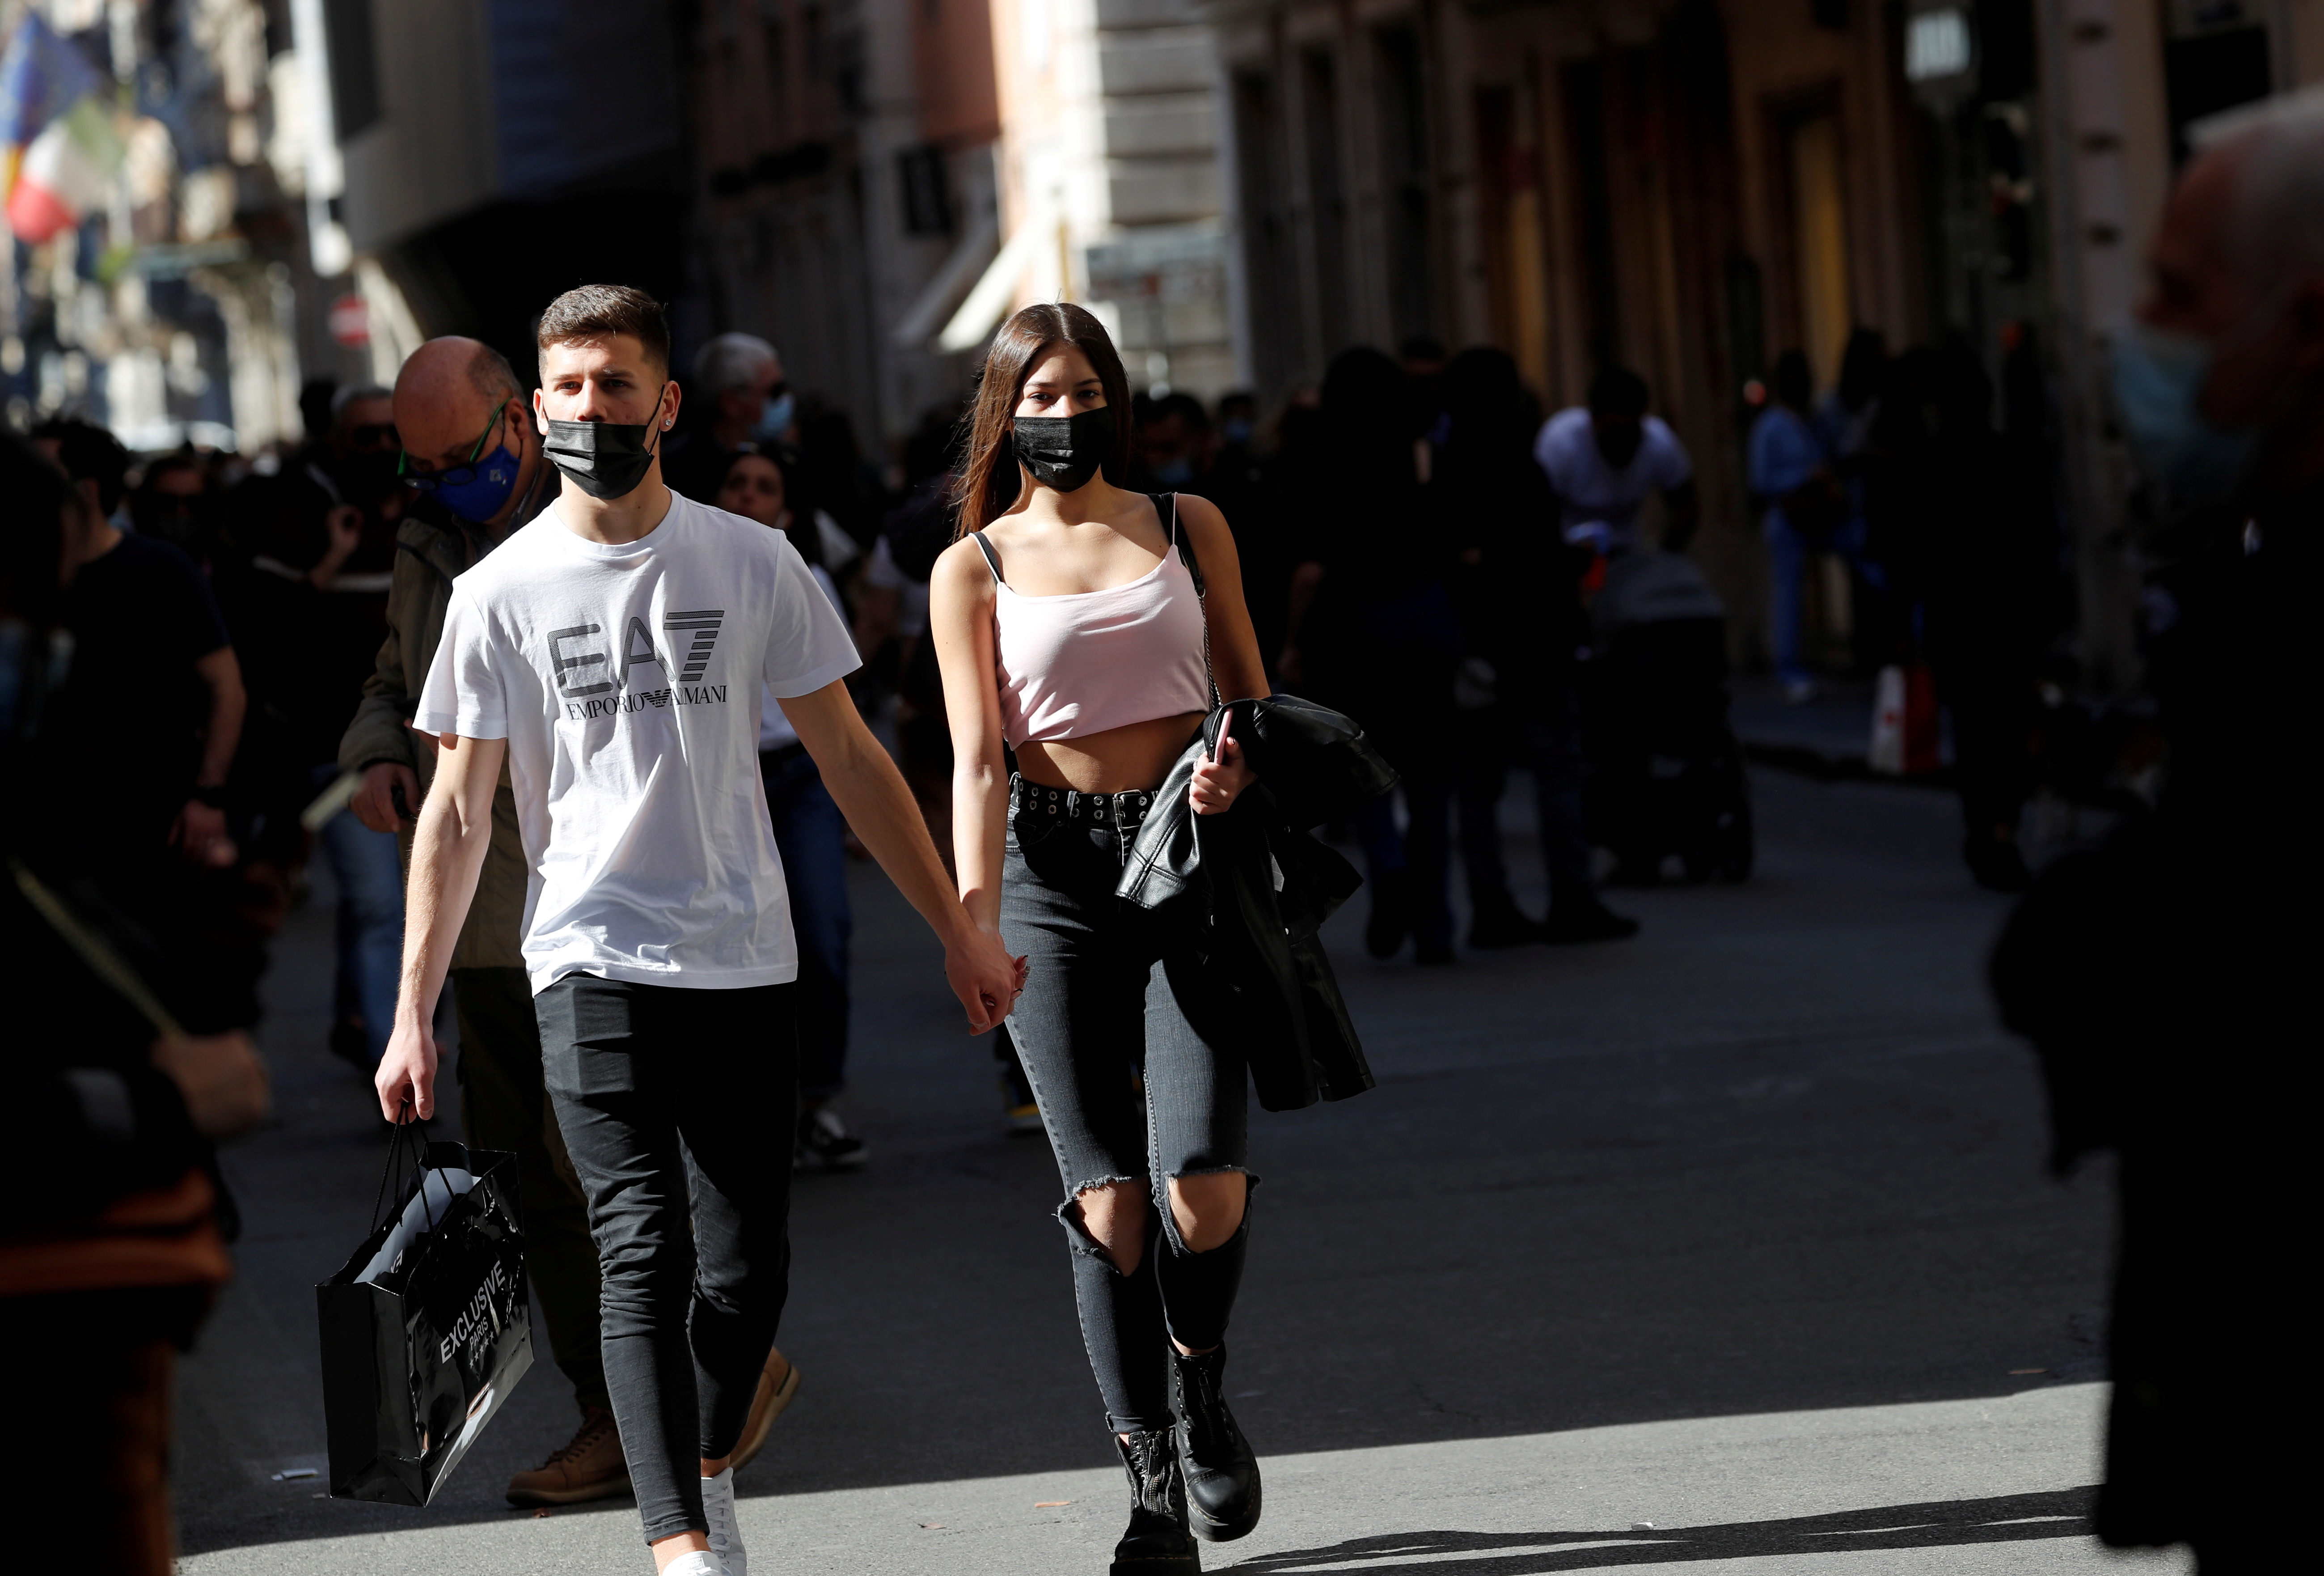 People walk down Via del Corso street amid the coronavirus disease (COVID-19) pandemic in Rome, Italy, April 24, 2021. REUTERS/Remo Casilli